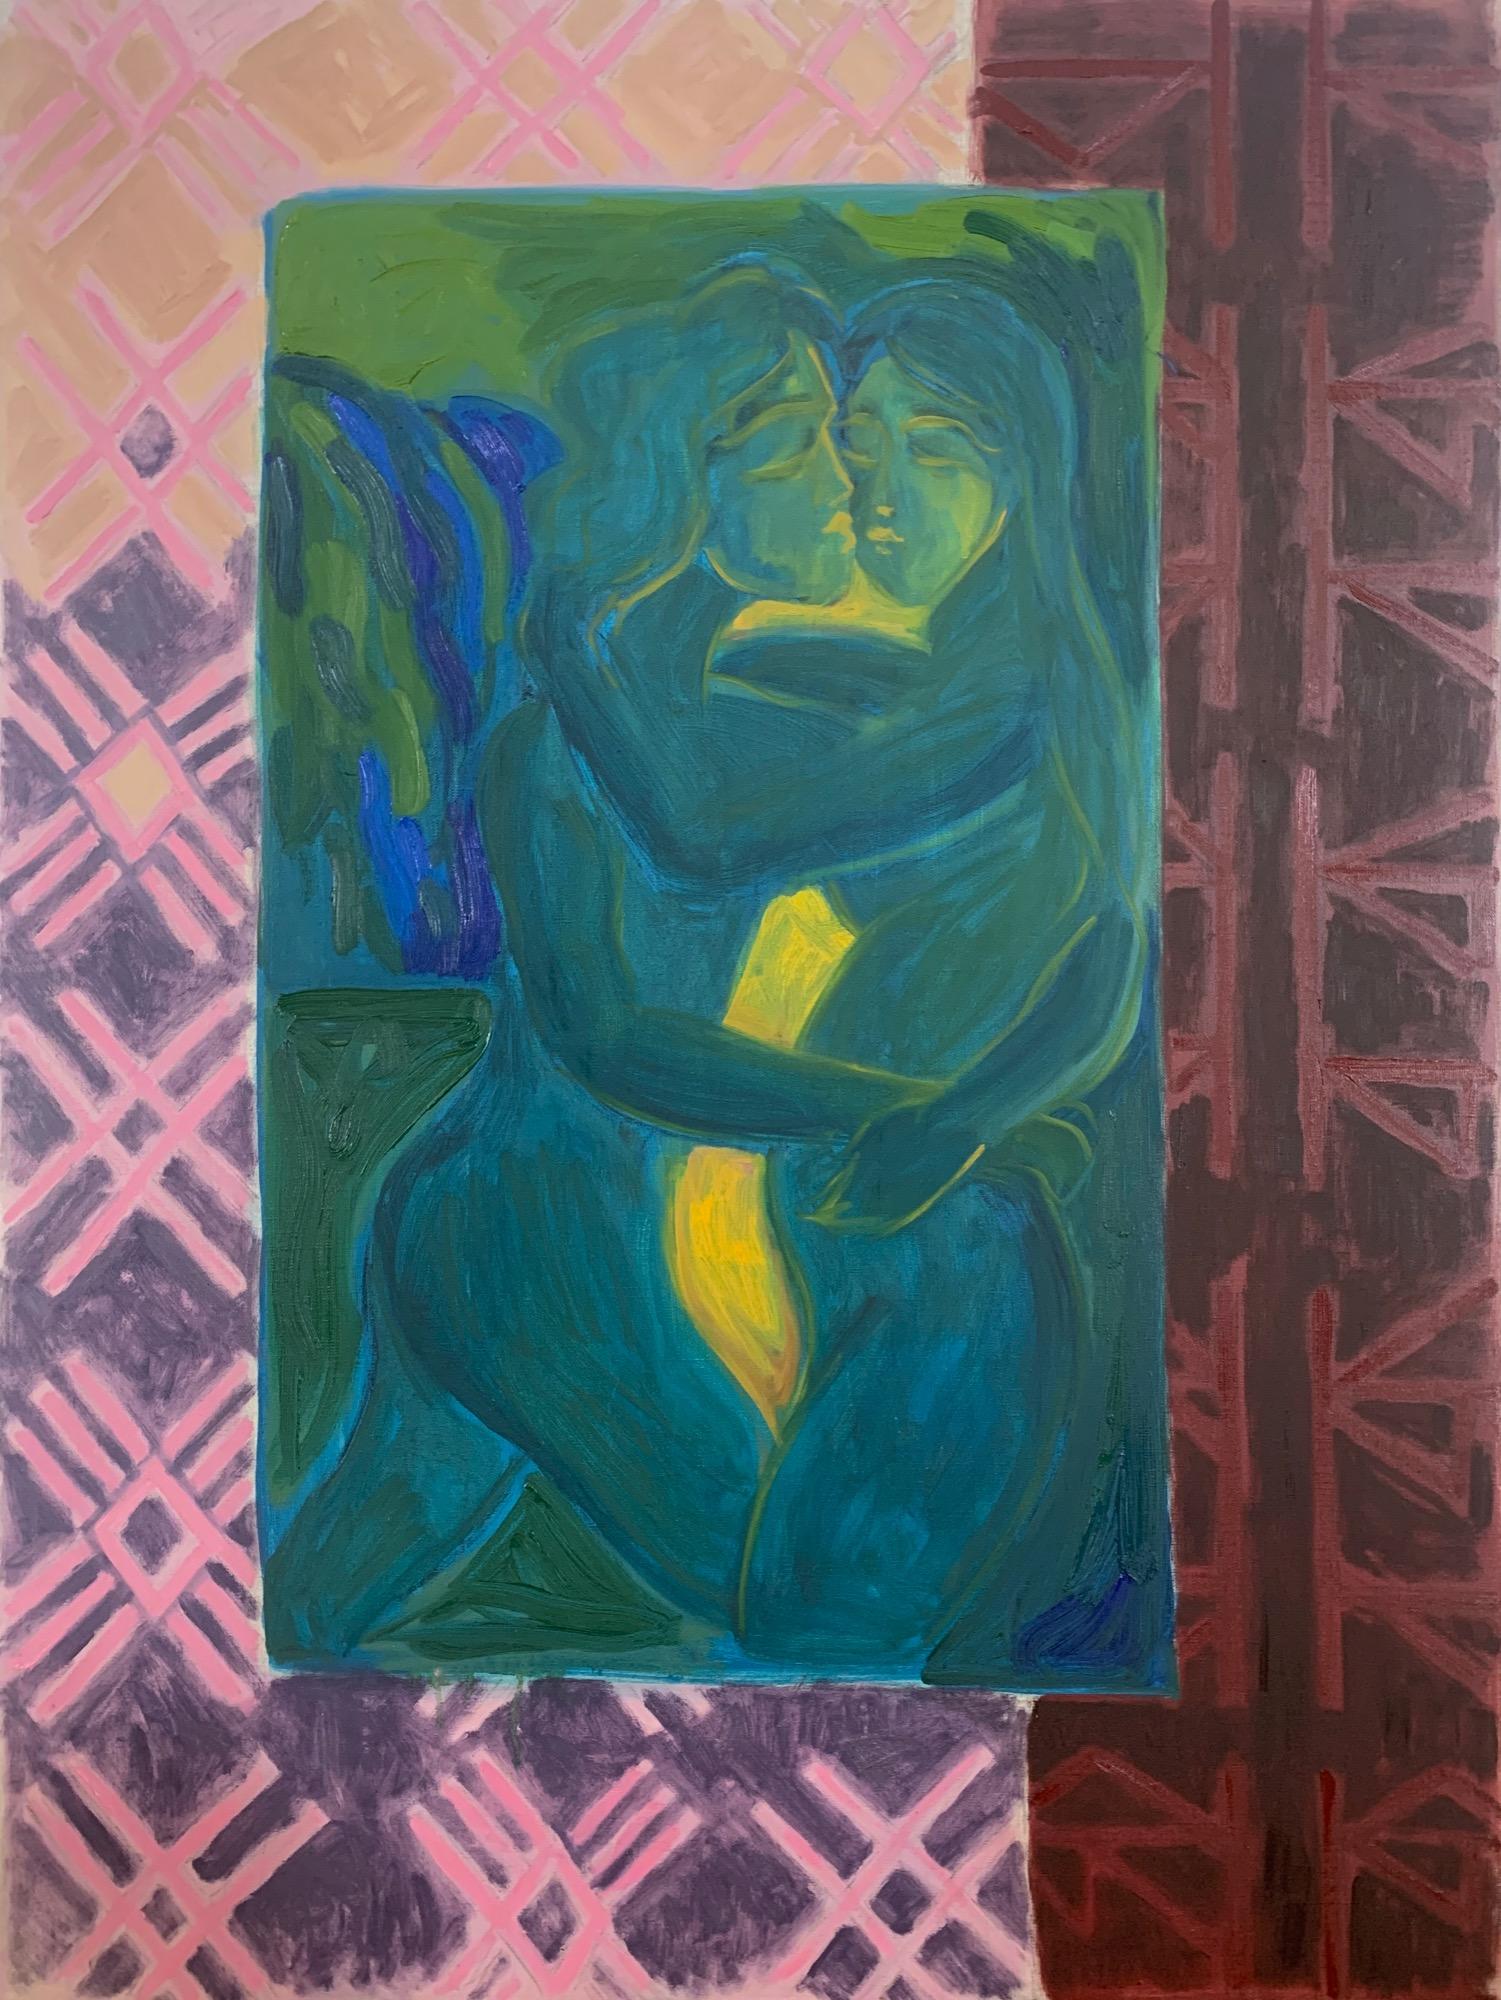 Nora-Persephone, II (Orpheus Kisses Nora on the Cheek)